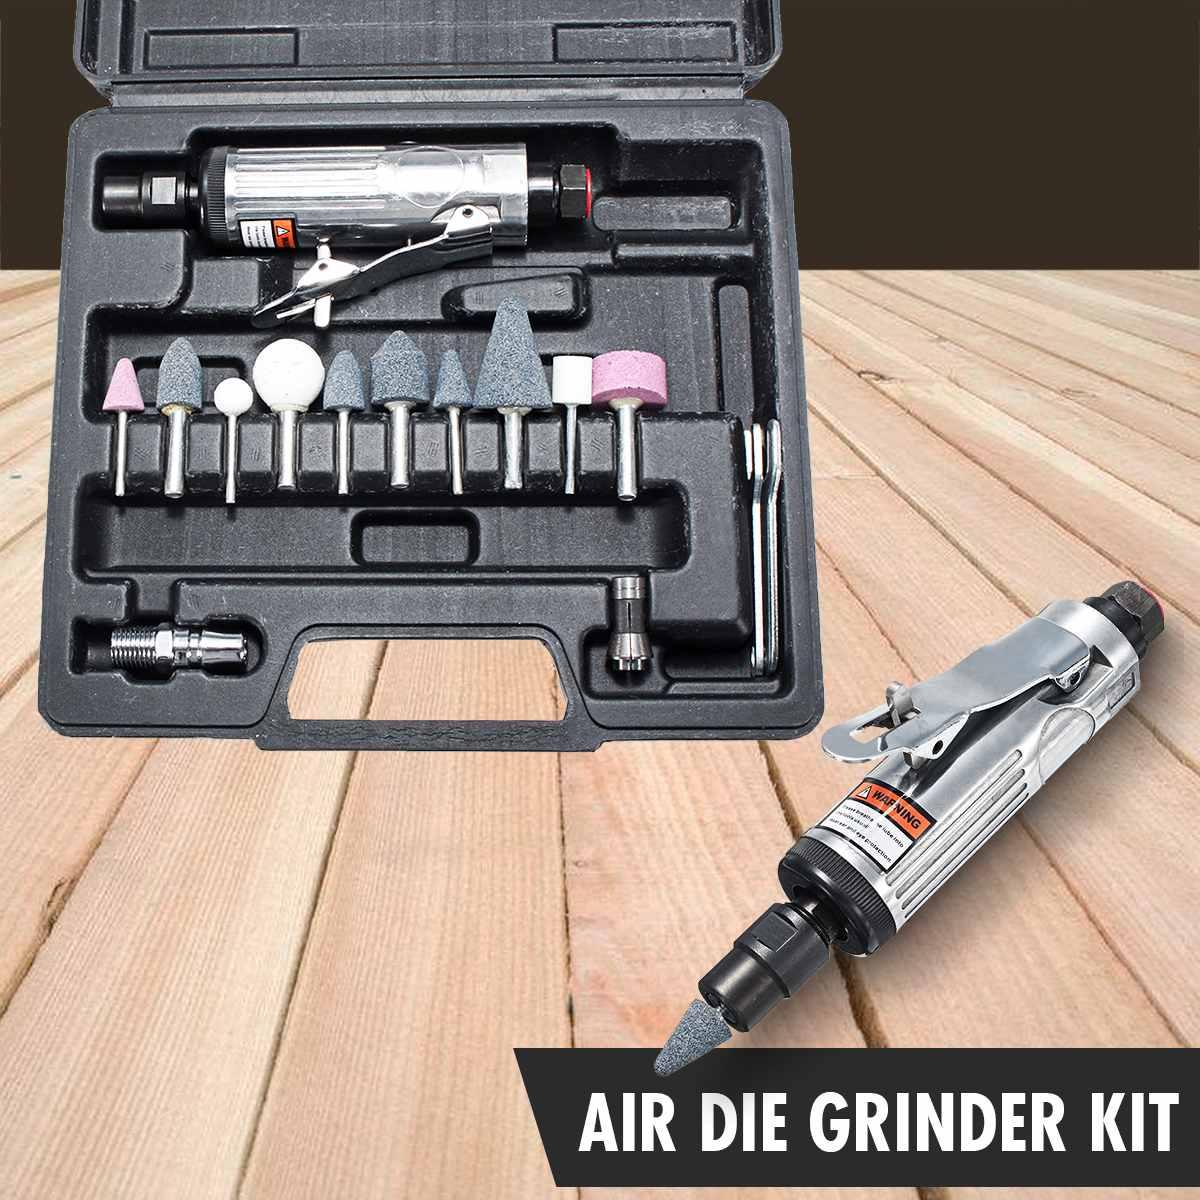 16 Pcs Air Compressor Die Grinder Grinding Polish Stone Kit 1/4 Inch Air Grinder Mill Engraving Tools Kits Pneumatic Tools